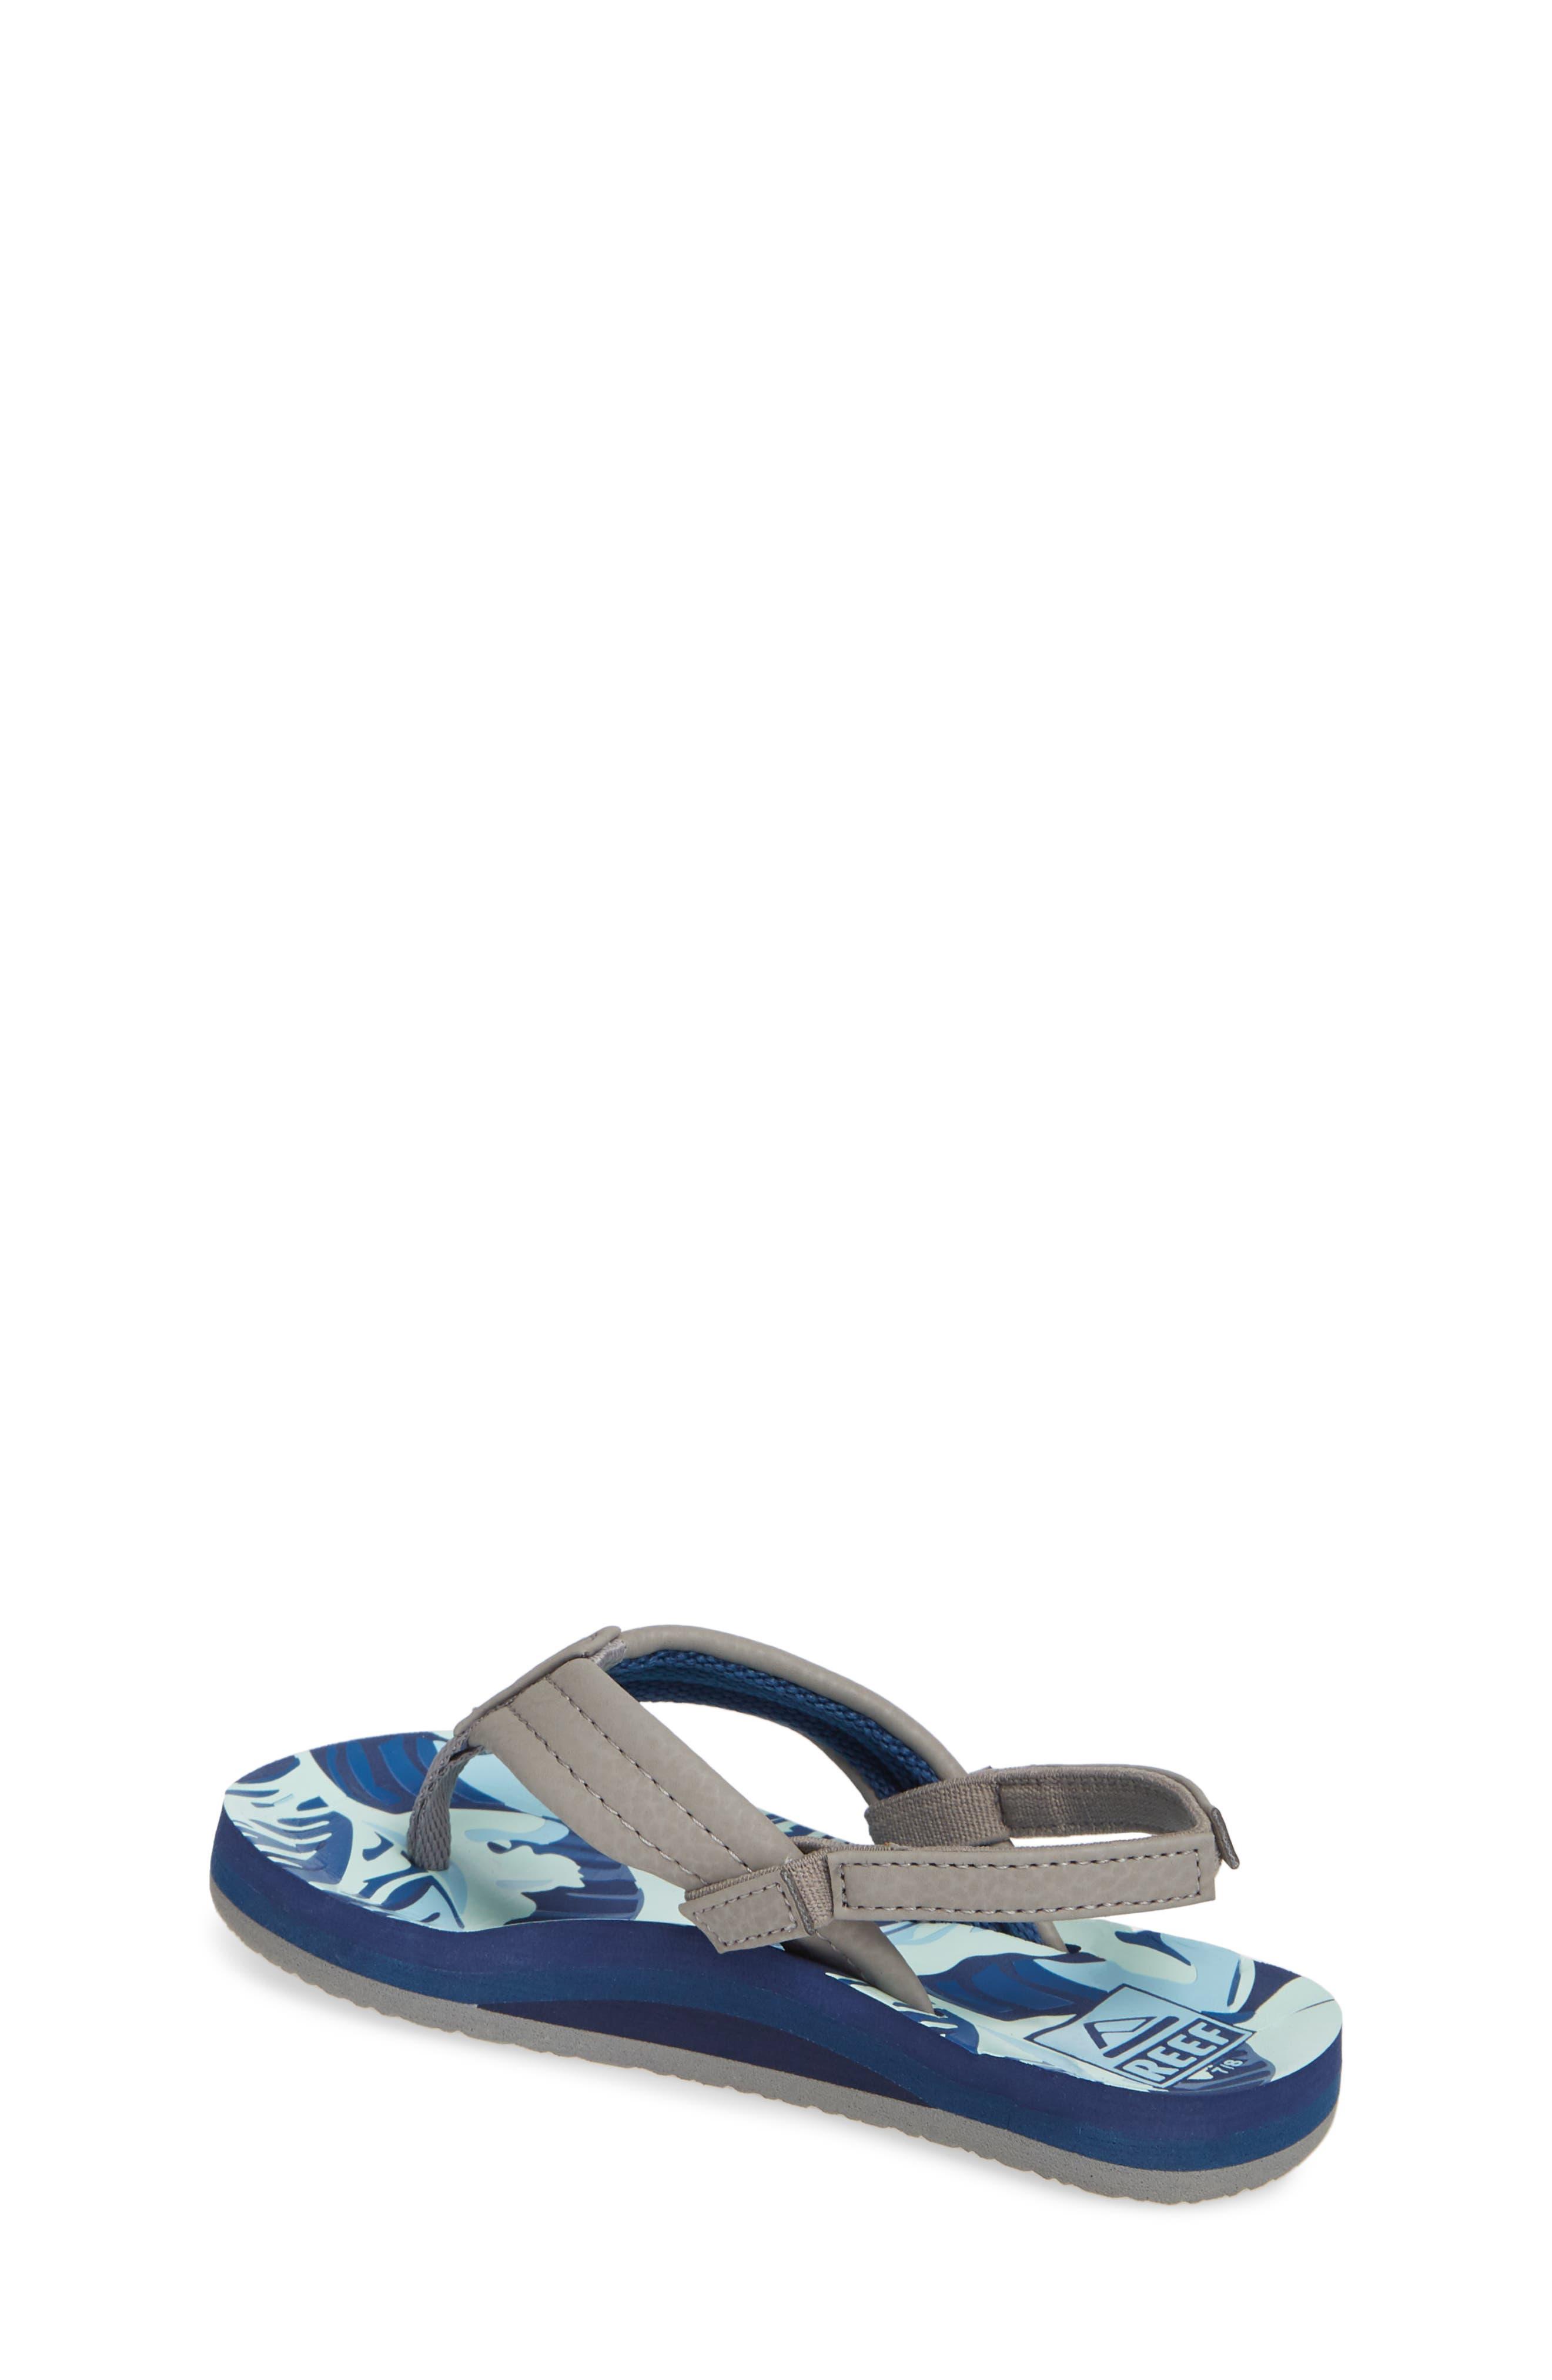 'Ahi' Sandal,                             Alternate thumbnail 2, color,                             BLUE